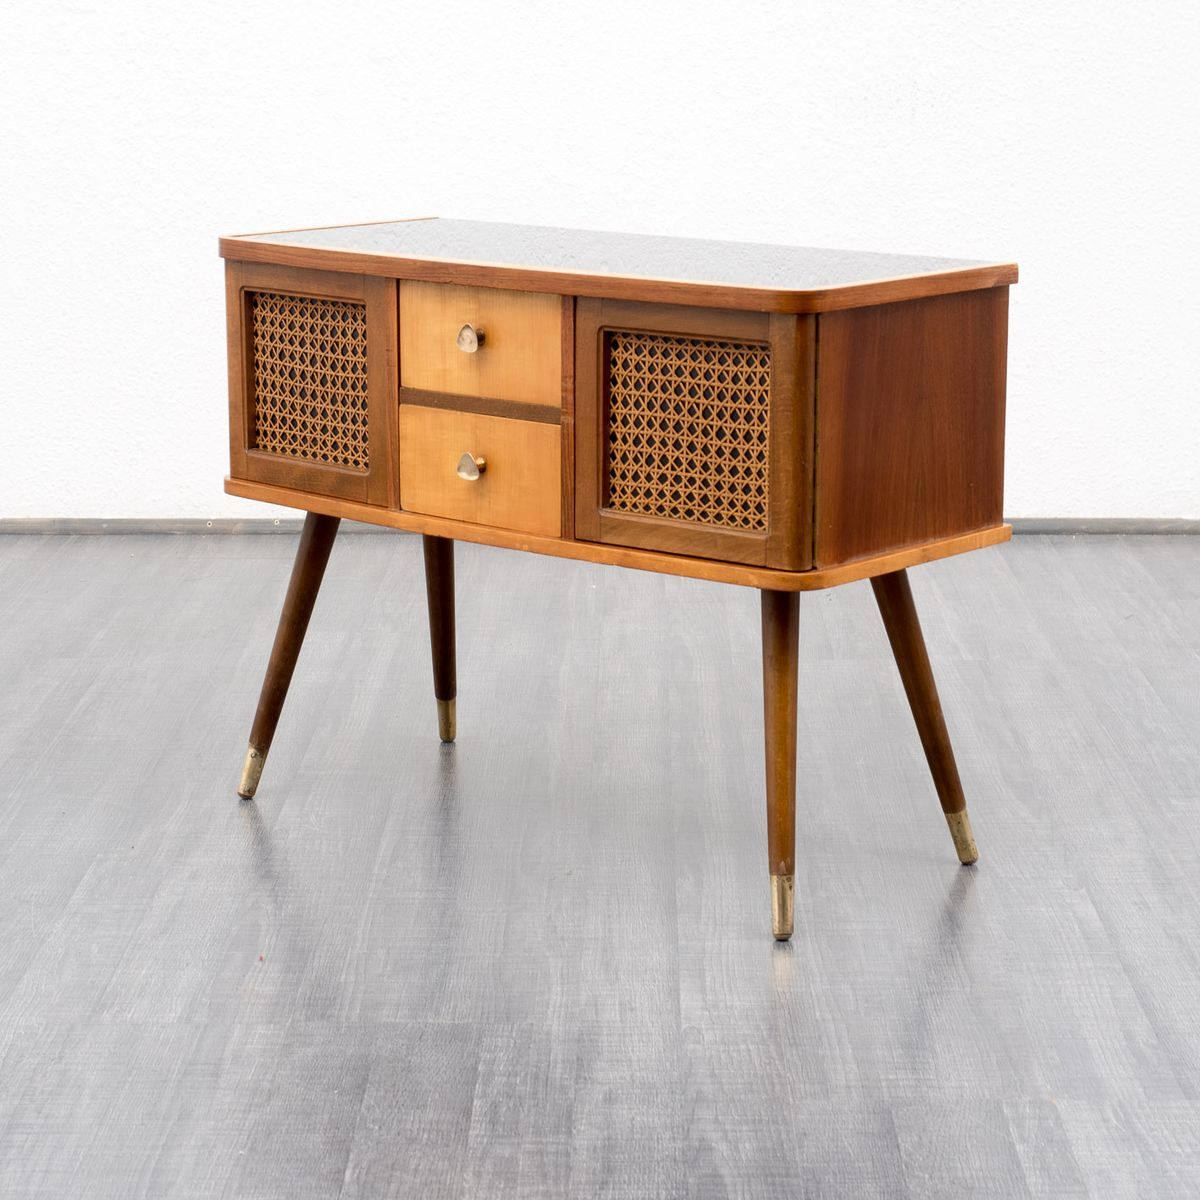 kommode ikea holz neuesten design kollektionen f r die familien. Black Bedroom Furniture Sets. Home Design Ideas